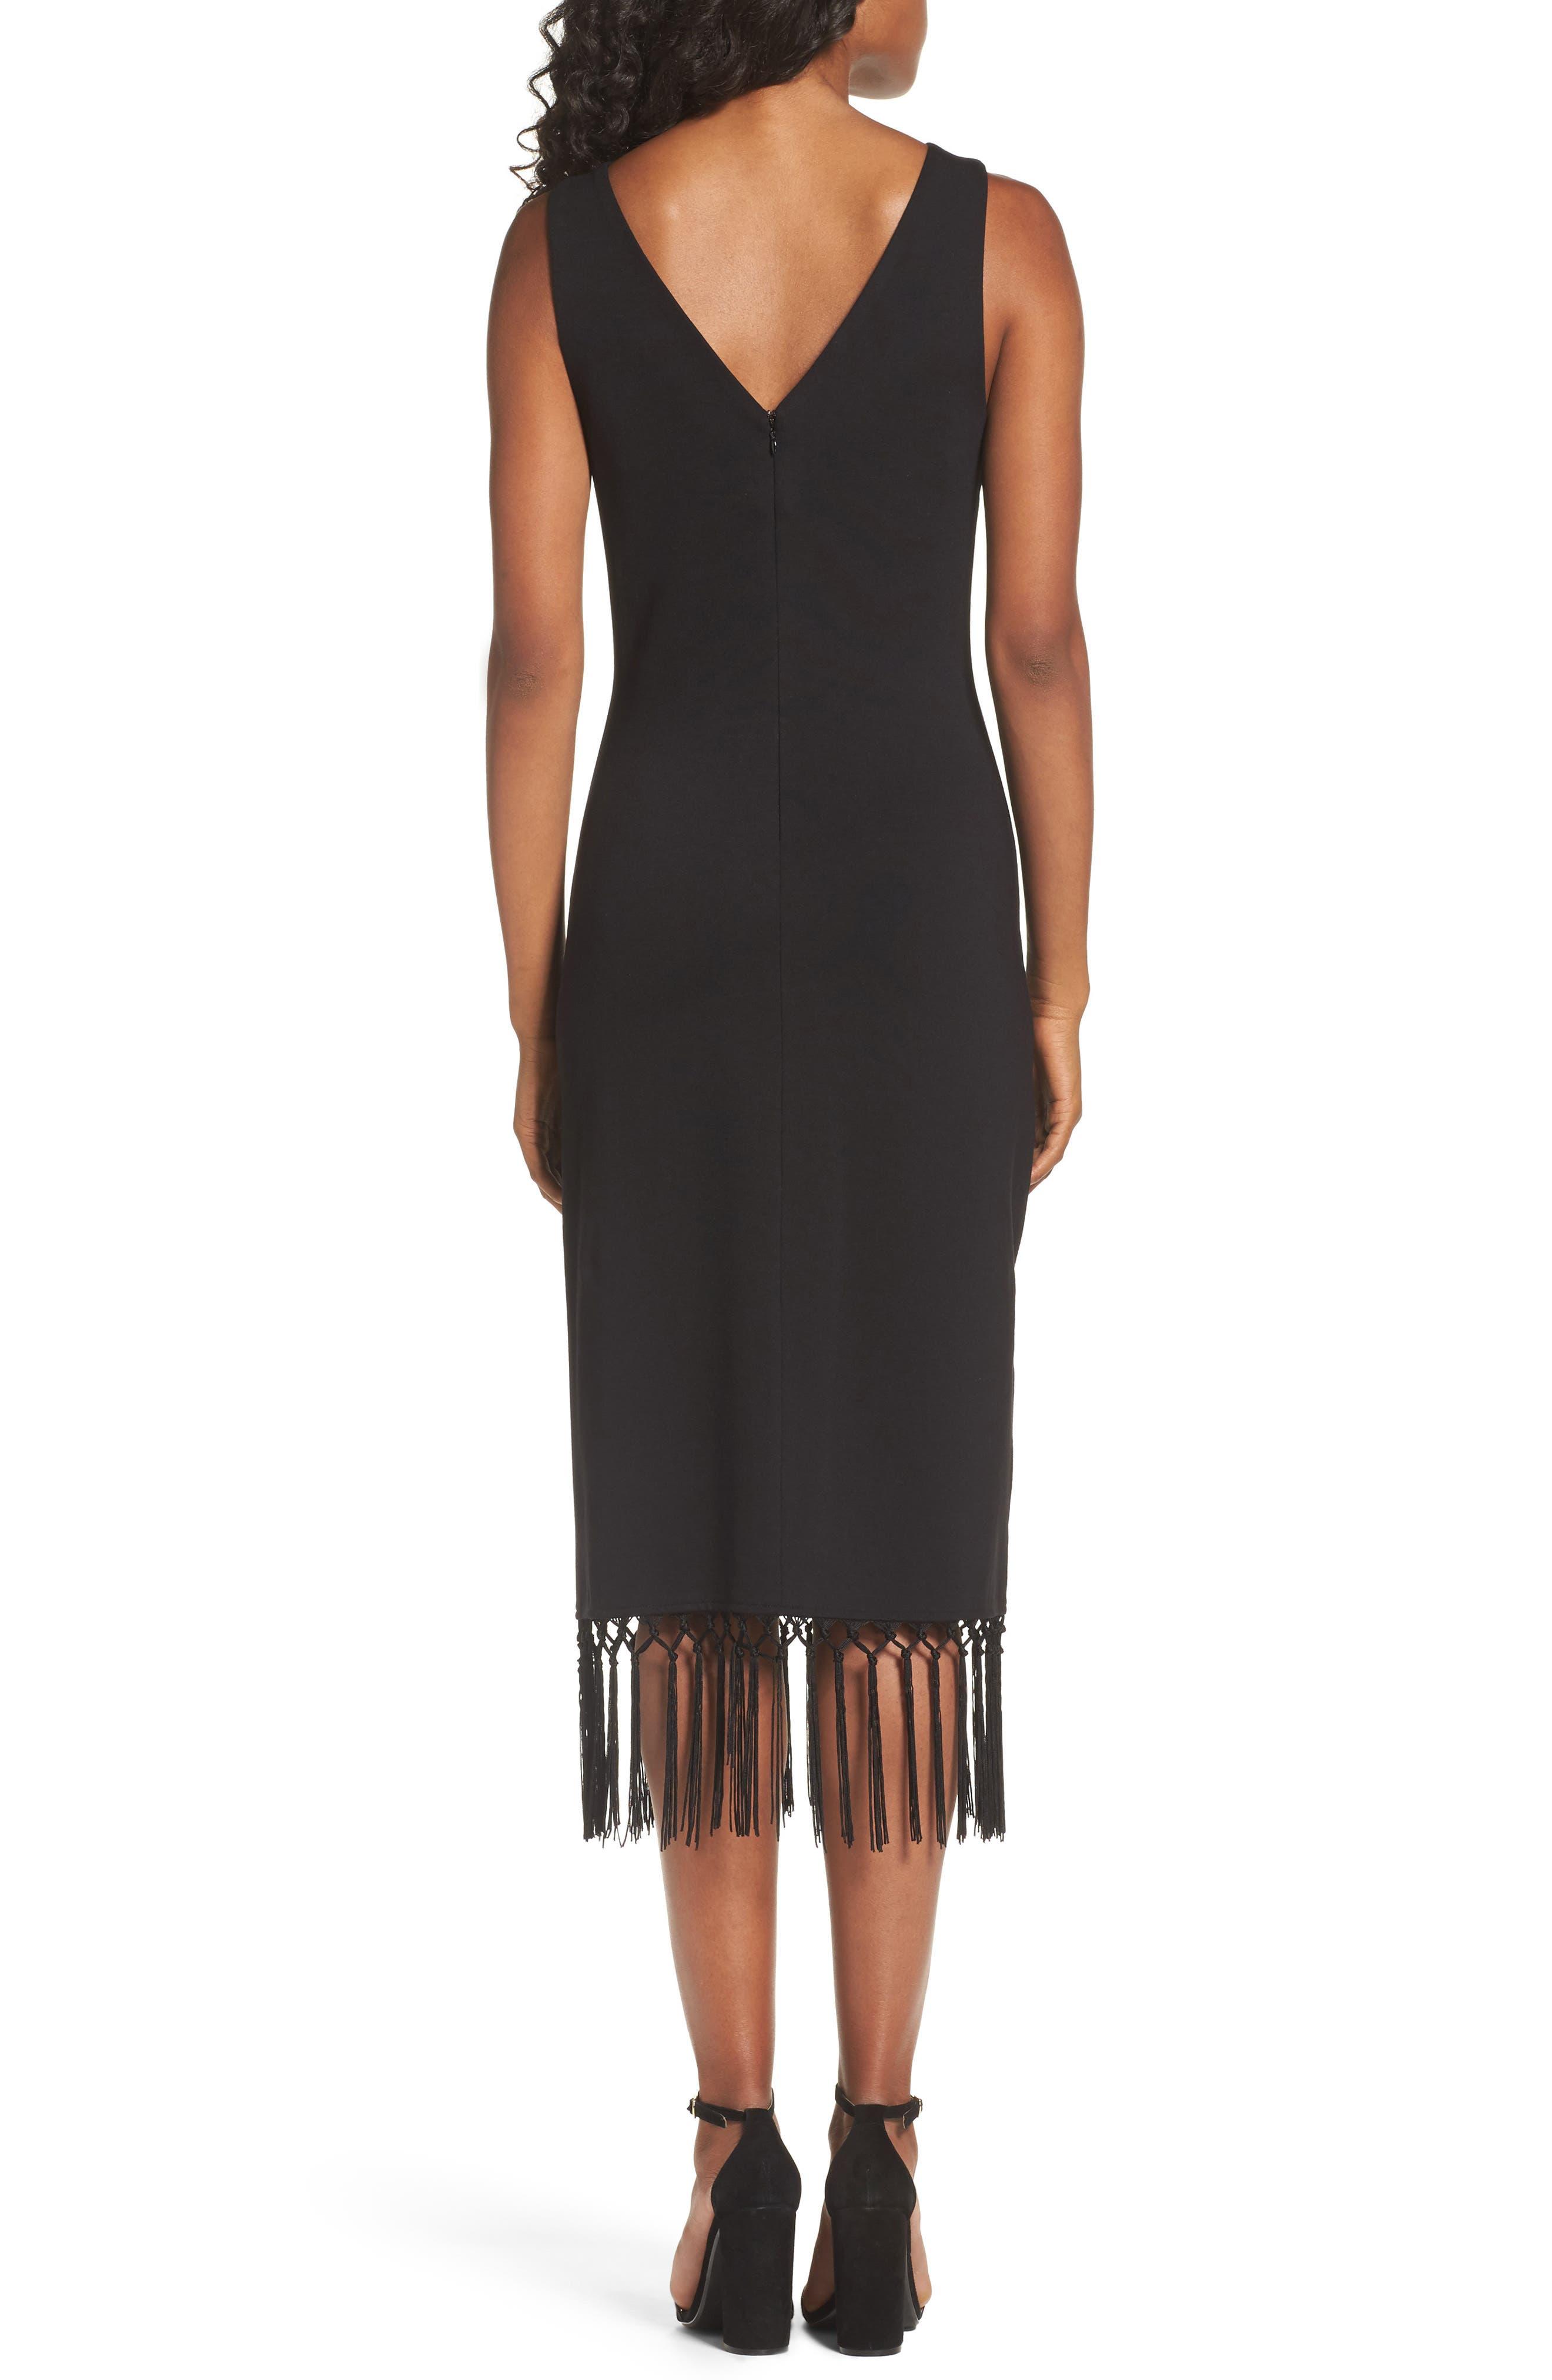 Tassel Midi Dress,                             Alternate thumbnail 2, color,                             Black